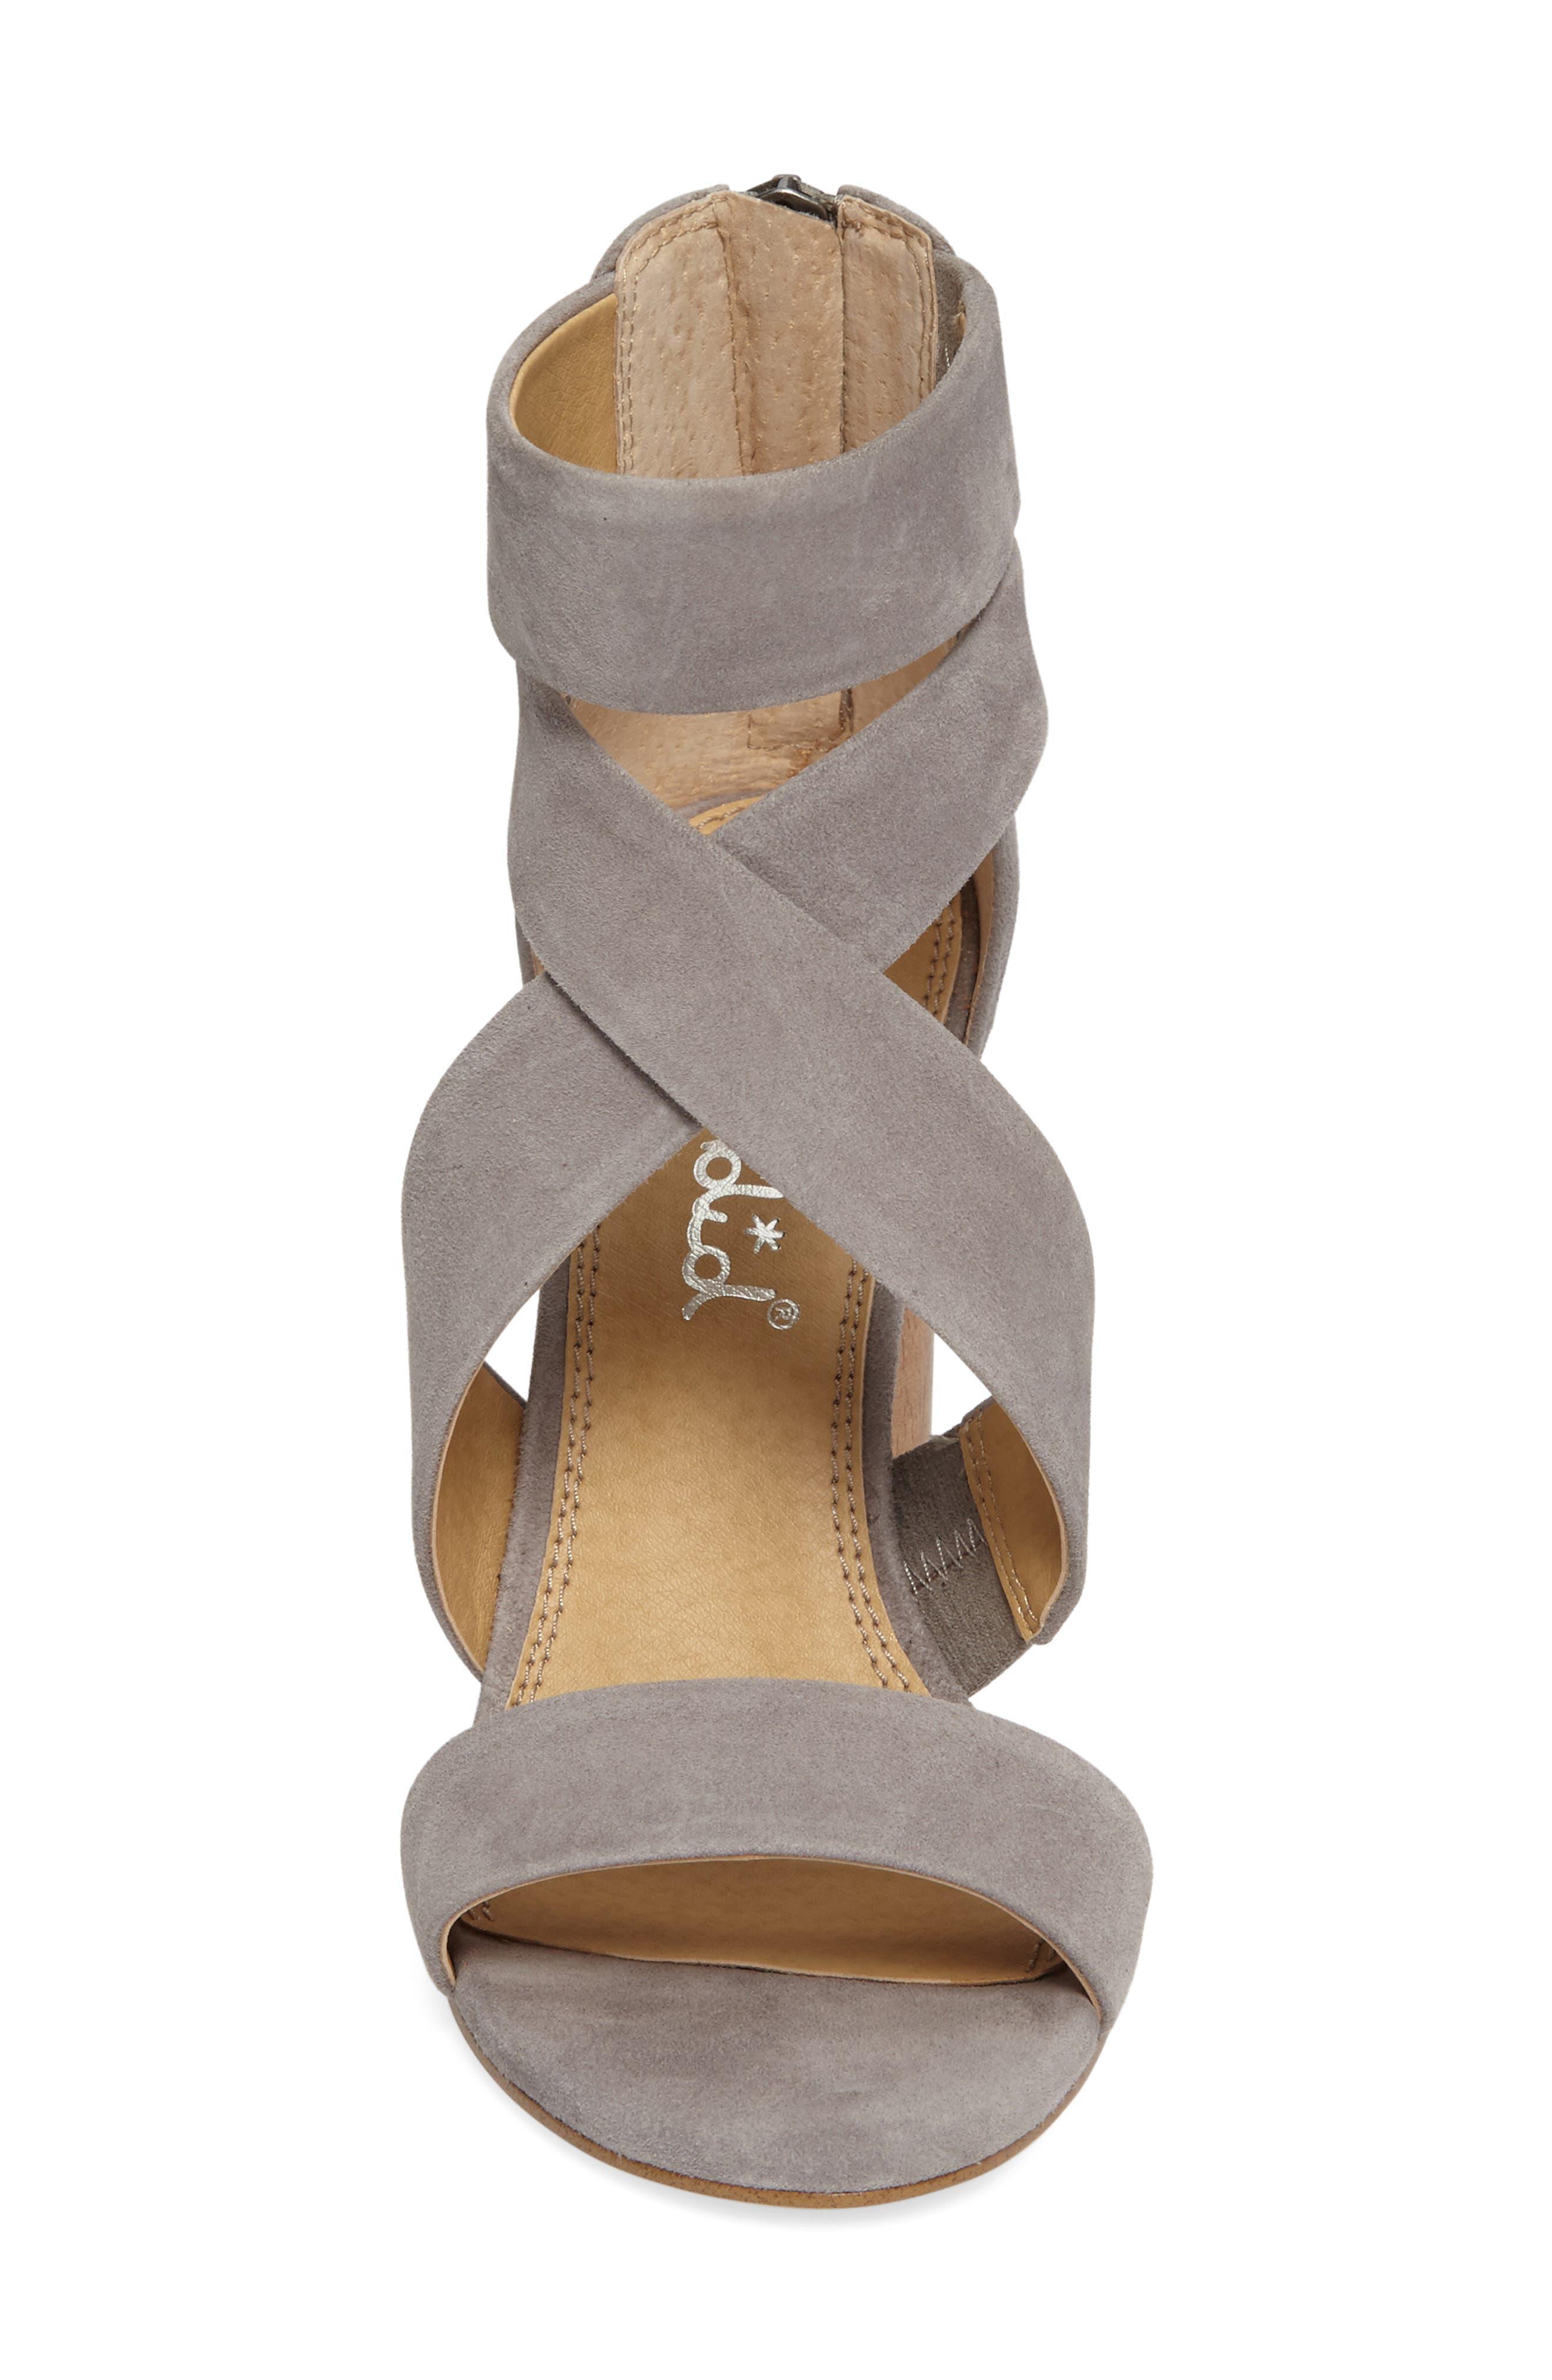 Jara Statement Heel Sandal,                             Alternate thumbnail 3, color,                             Light Grey Suede